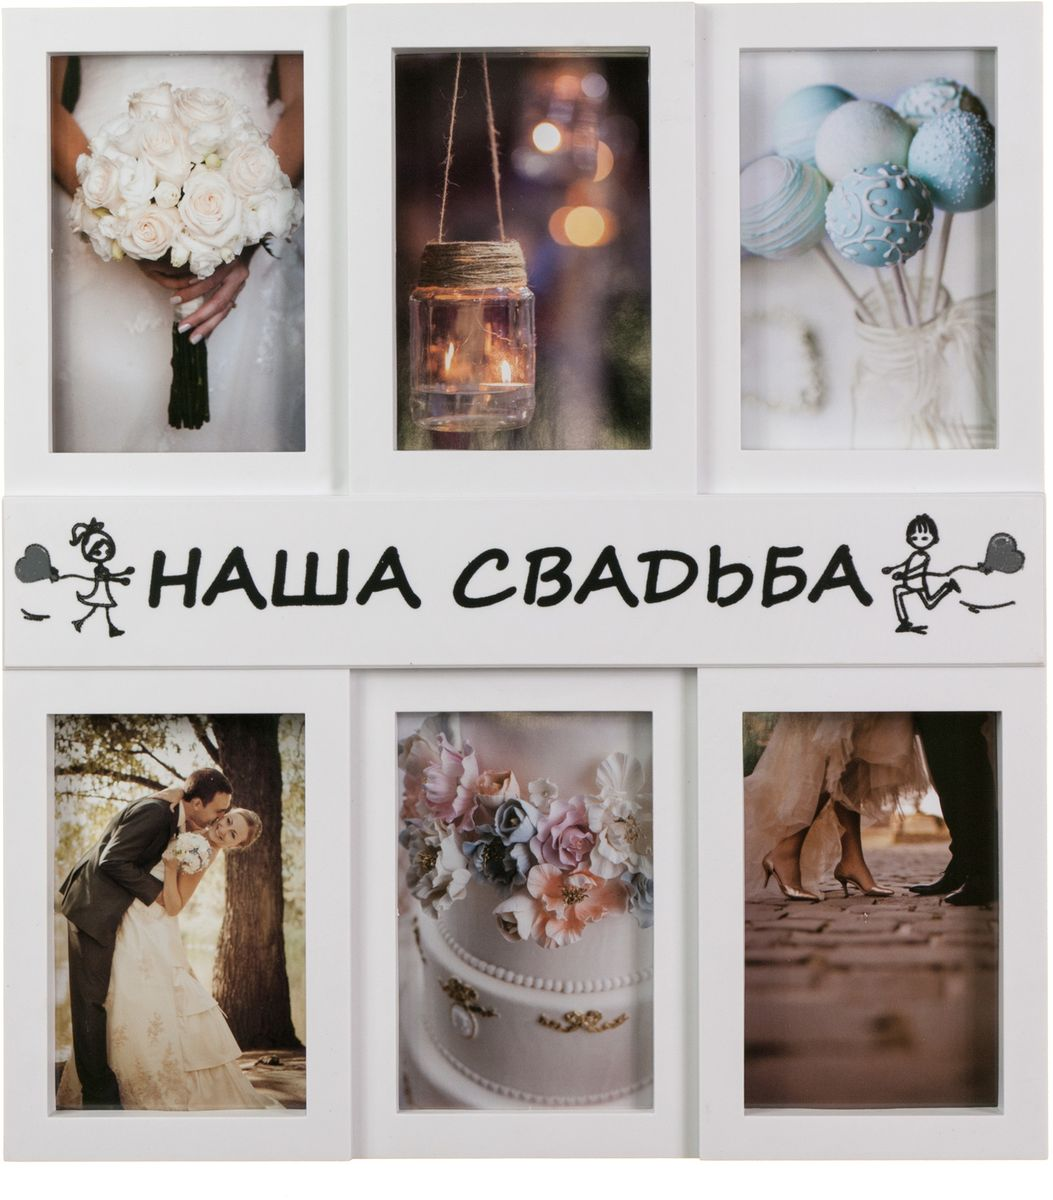 Фоторамка Platinum Наша свадьба, цвет: белый, на 6 фото, 10 х 15 см. BG-2522 фоторамка коллаж platinum 6 фото цвет бежевый